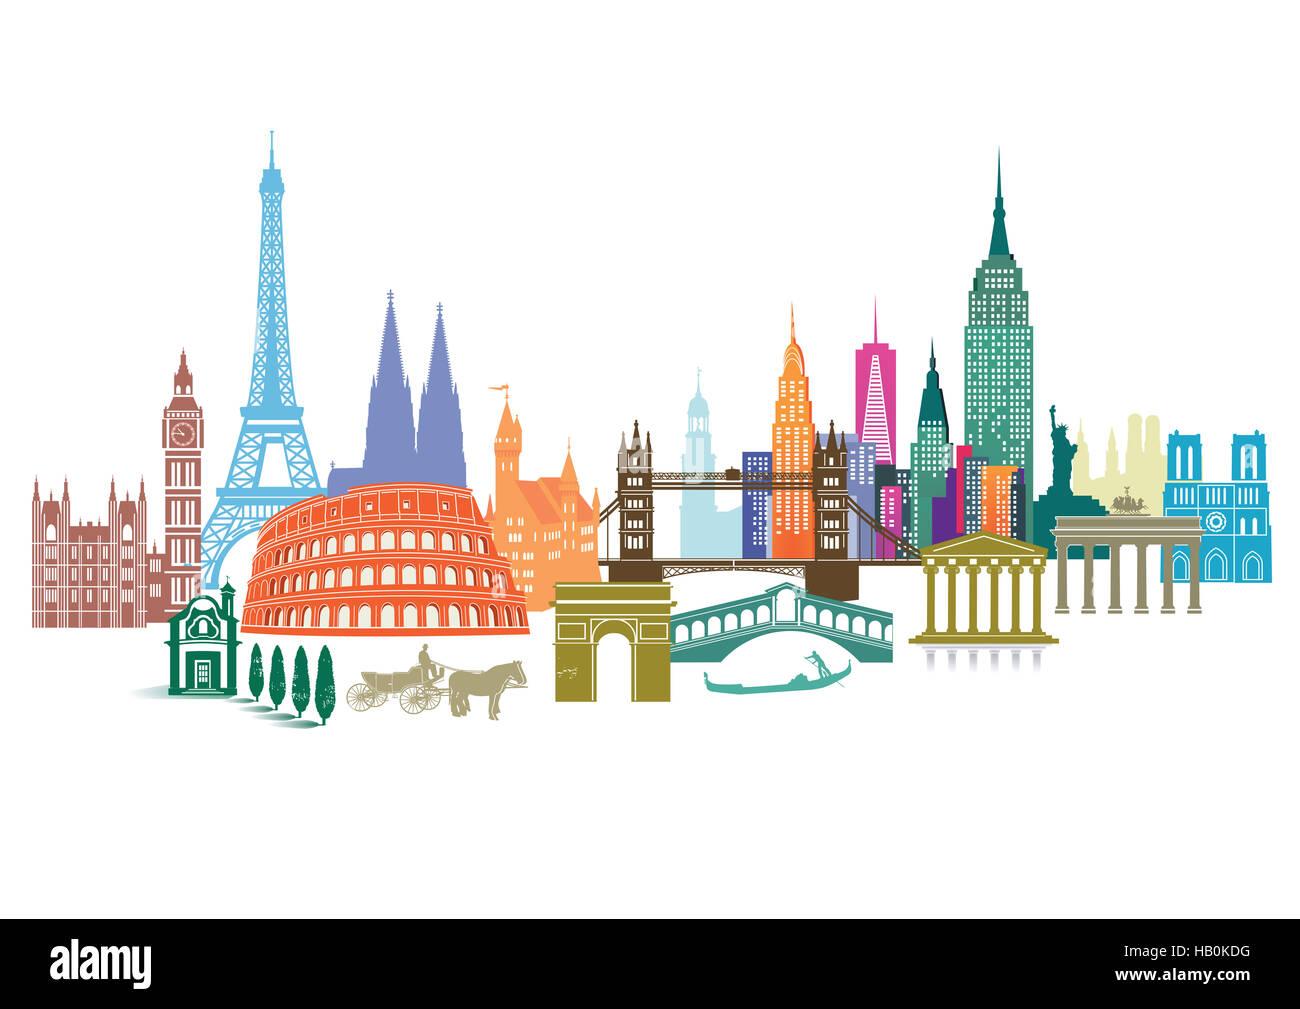 Travel Landmark - Stock Image